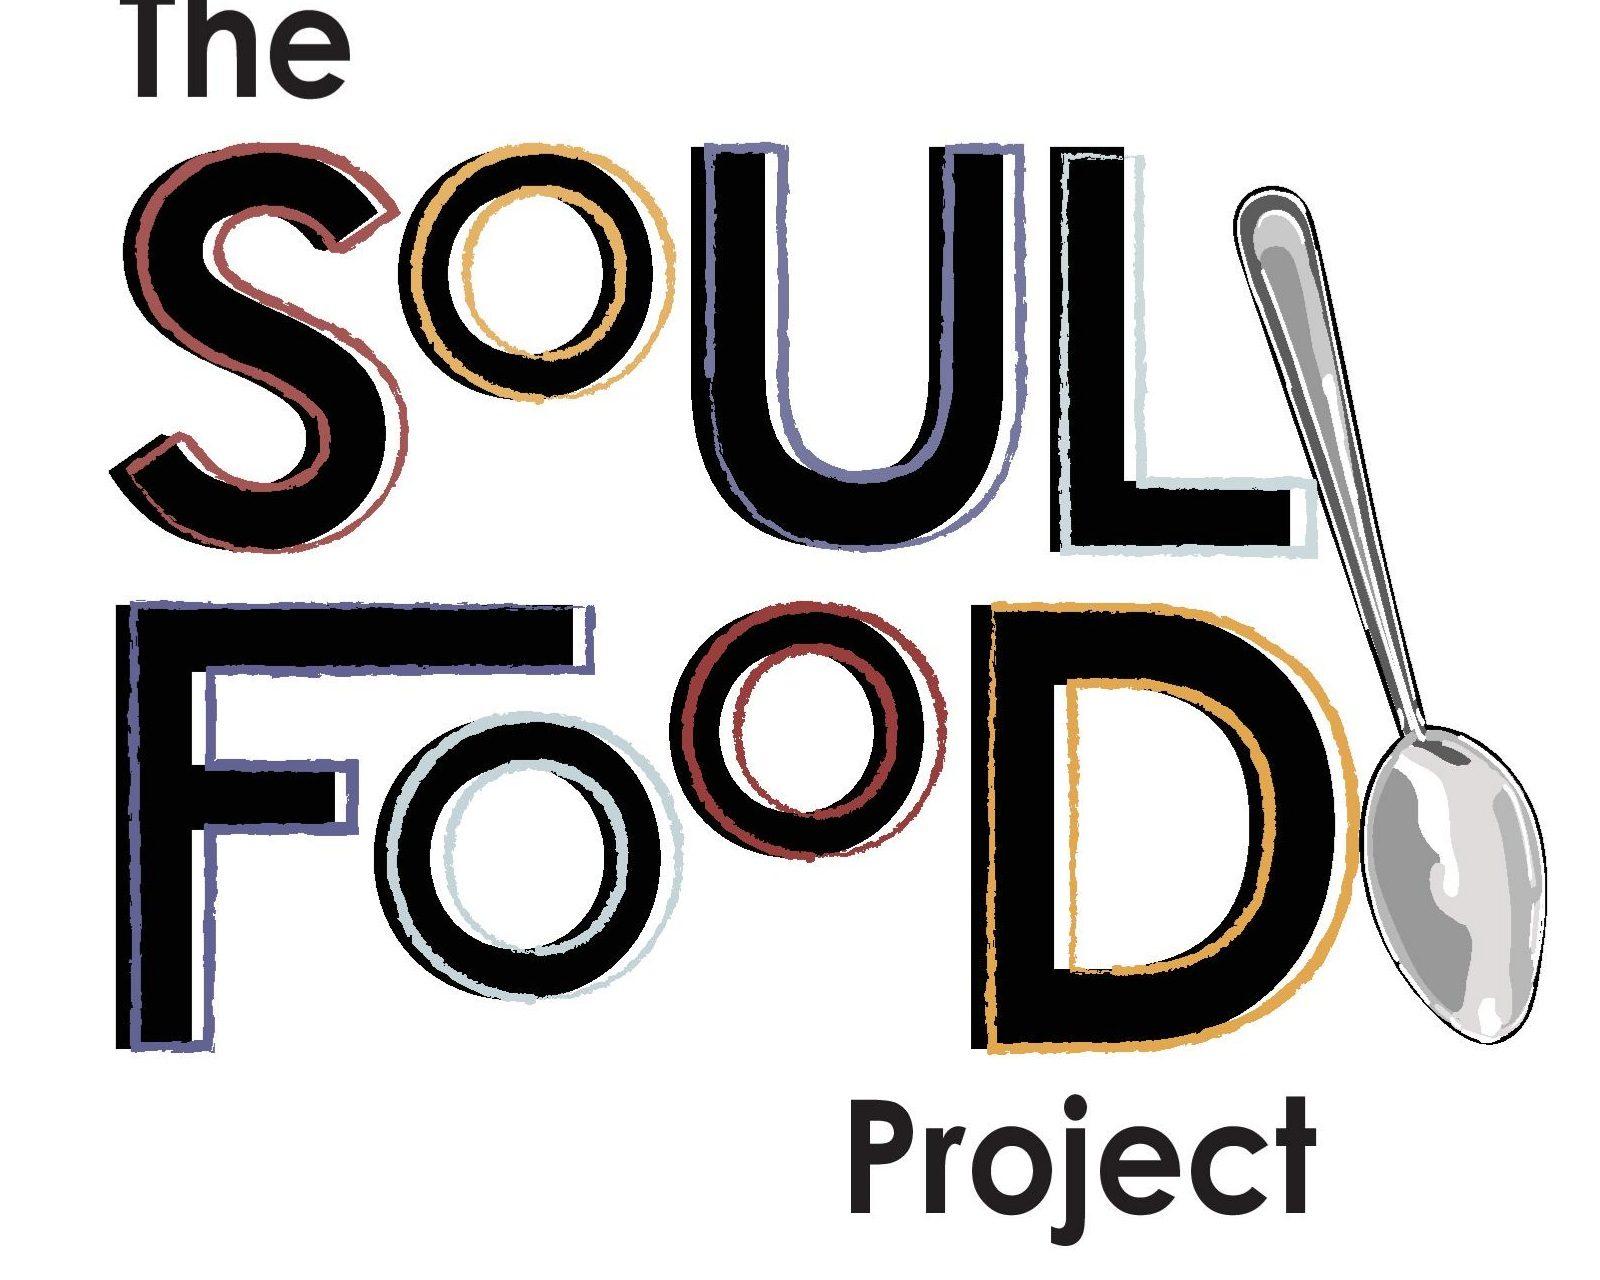 Soul Food Project logo